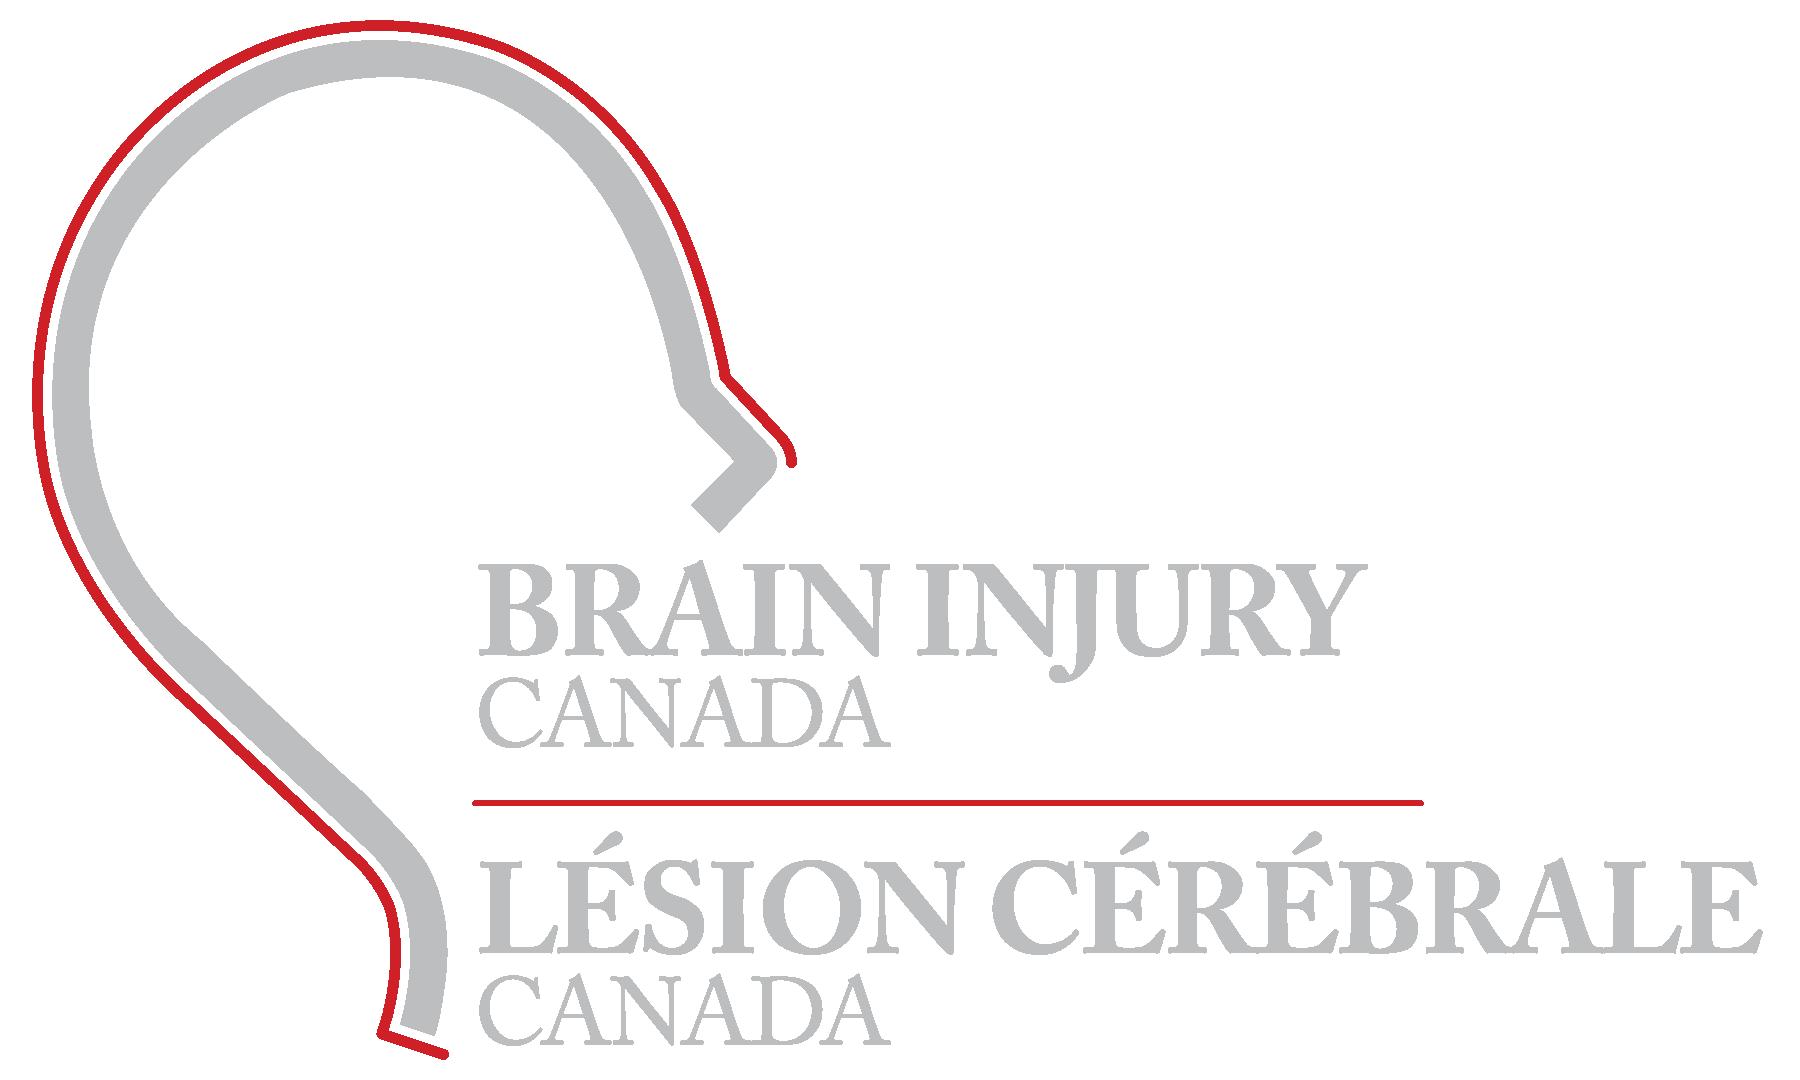 Brain Injury Canada